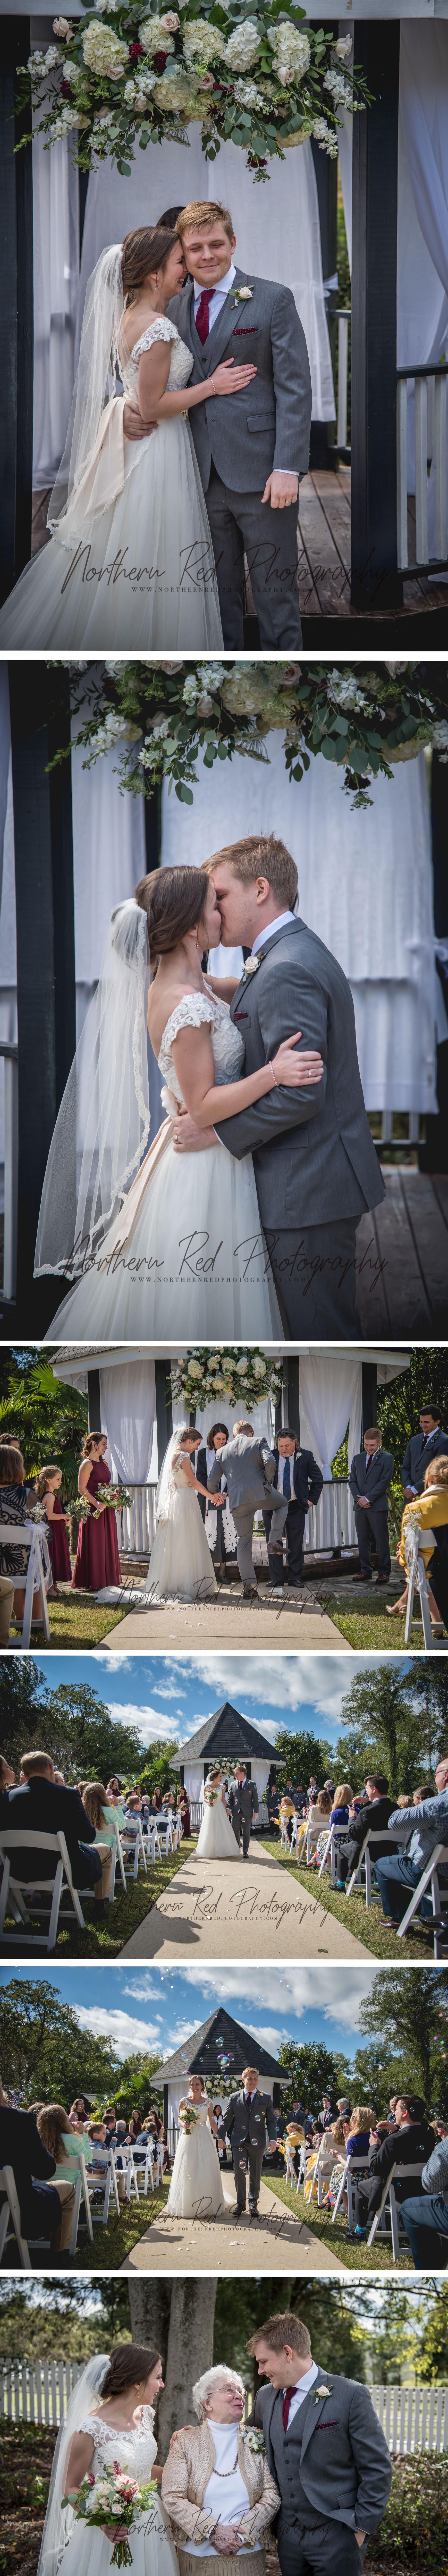 South Carolina Wedding Photography NorthernRedPhotography